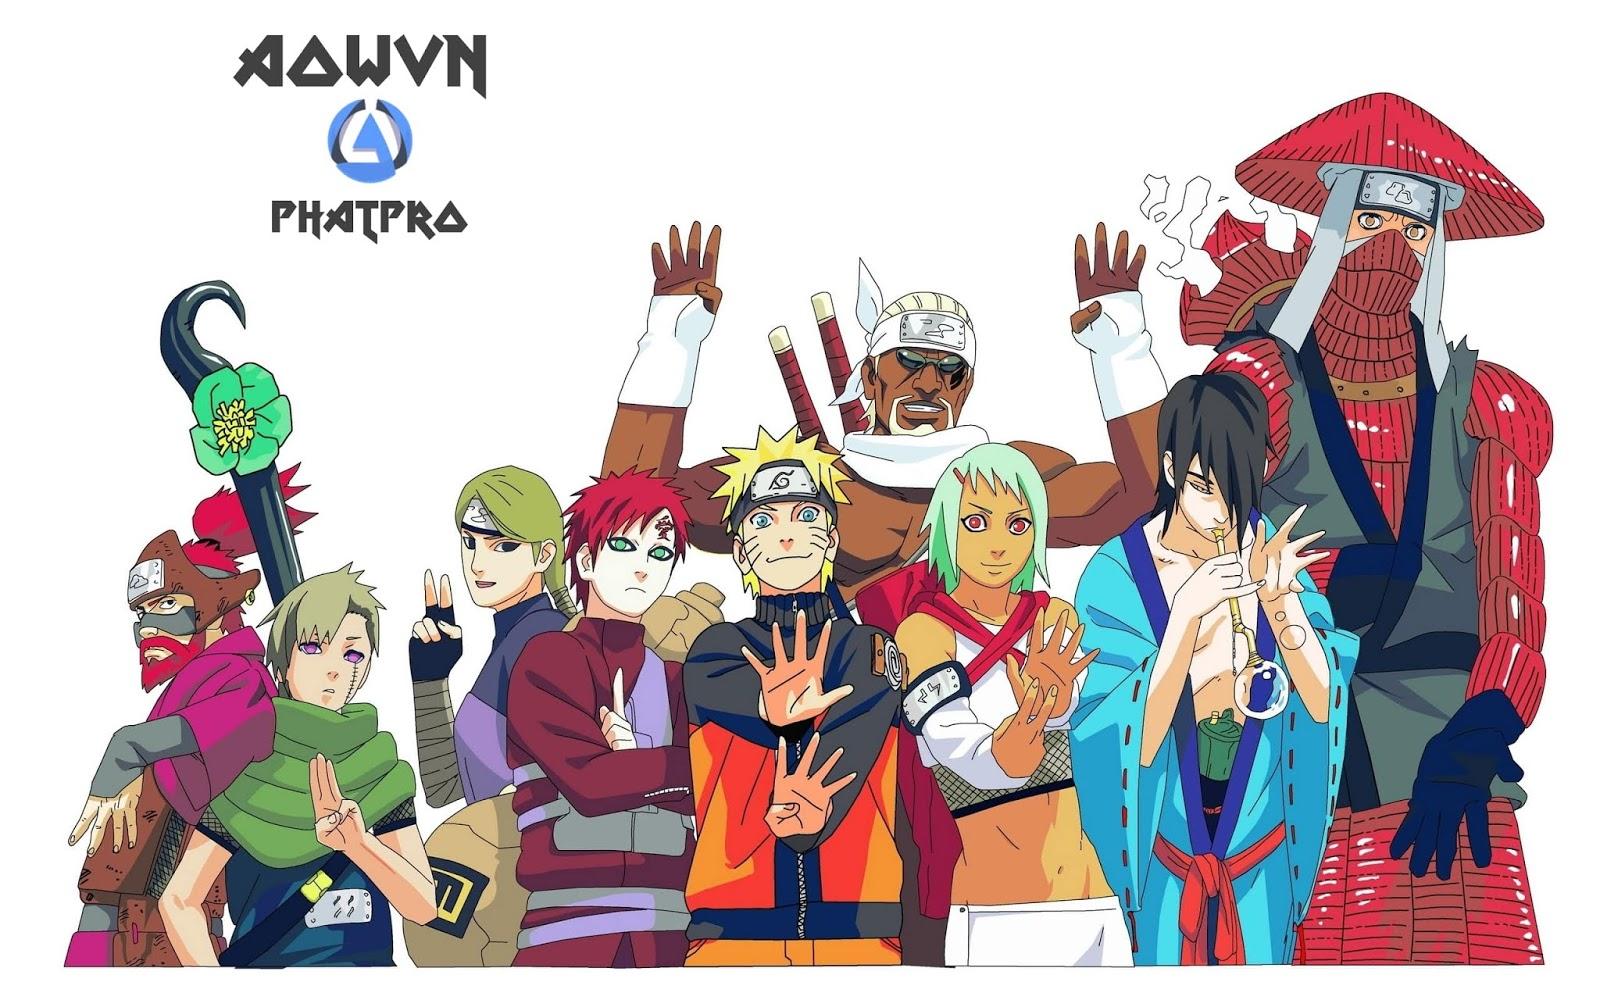 Naruto%2B %2BPhatpro min - [ Anime 3gp Mp4 ] Naruto Ova | Vietsub - Cực Hài